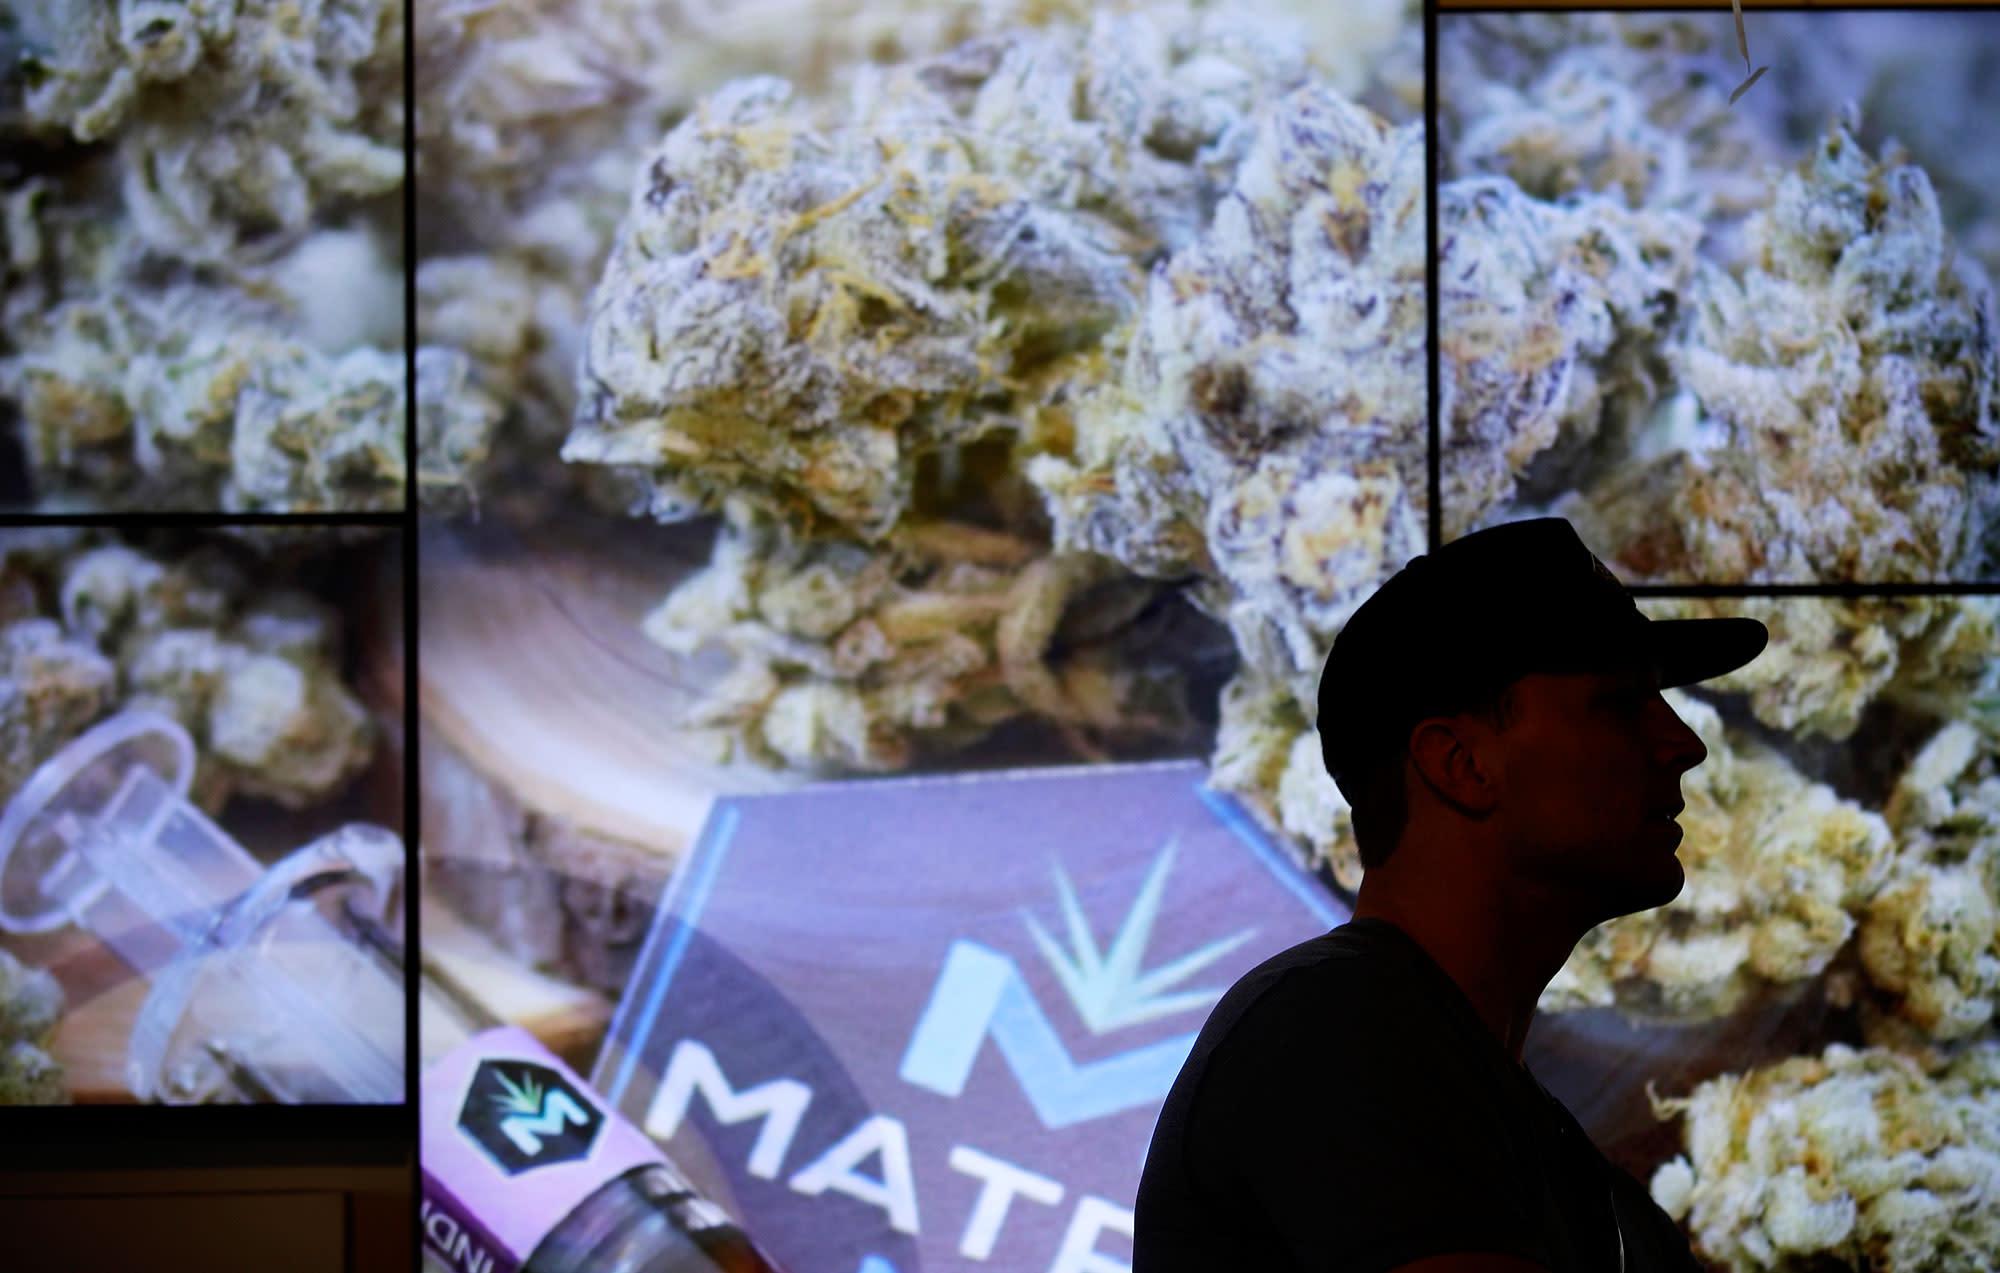 Recreational marijuana becomes legal in Nevada